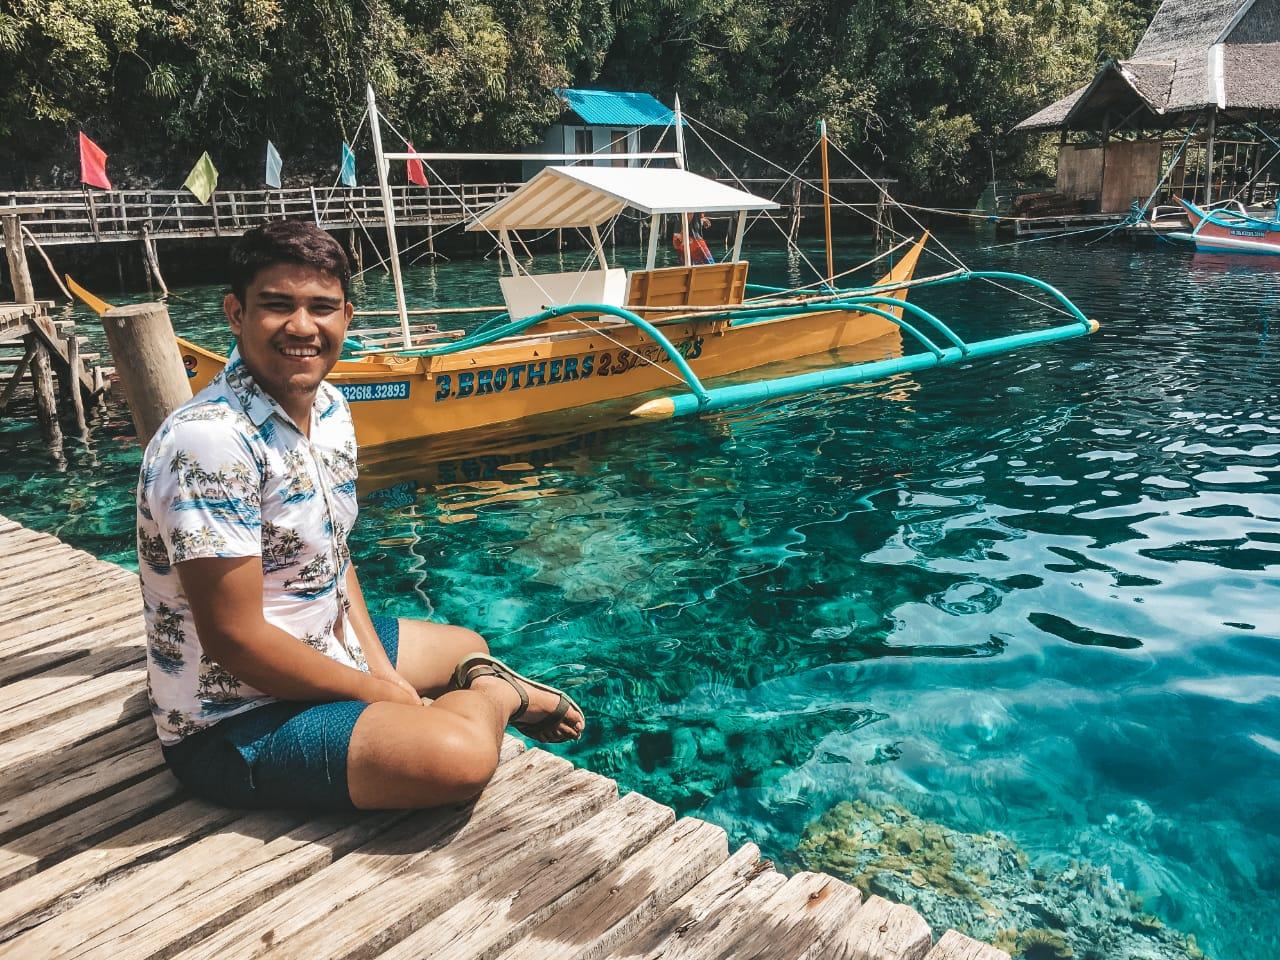 Travel Guide to Sohoton Cove, Bucas Grande, Surigao del Norte, Philippines